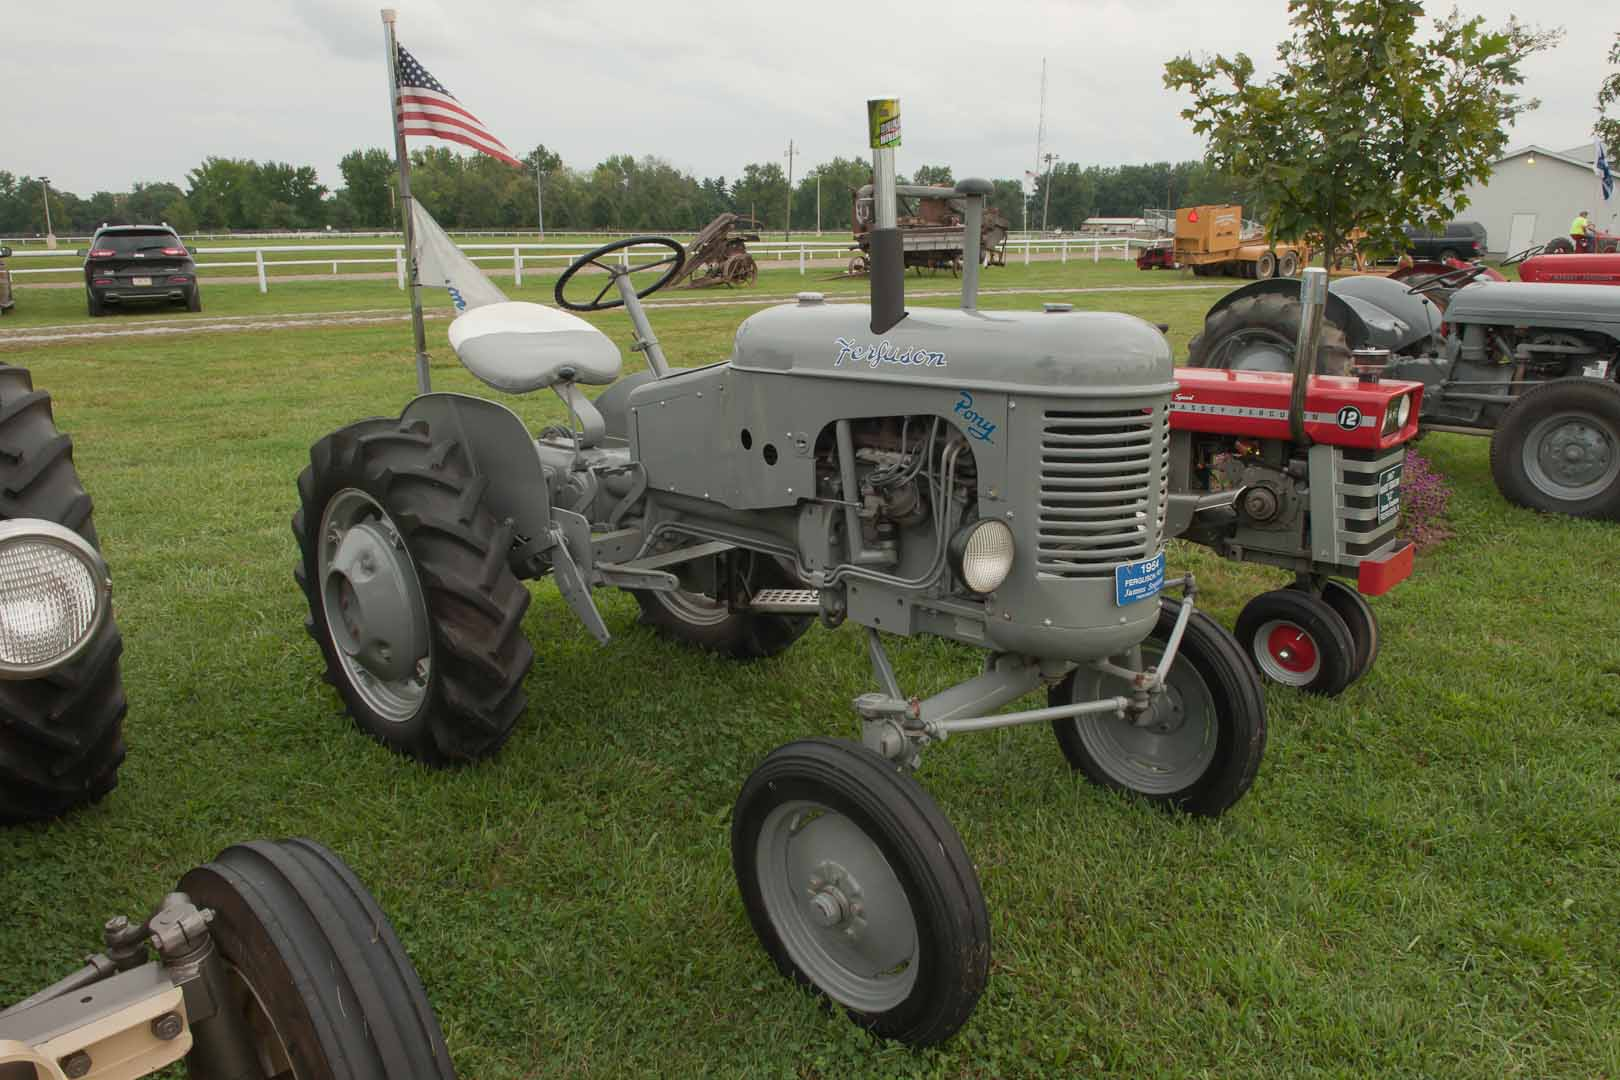 1954 Ferguson Pony  owned by James Stephens of Fredericksburg, IN.